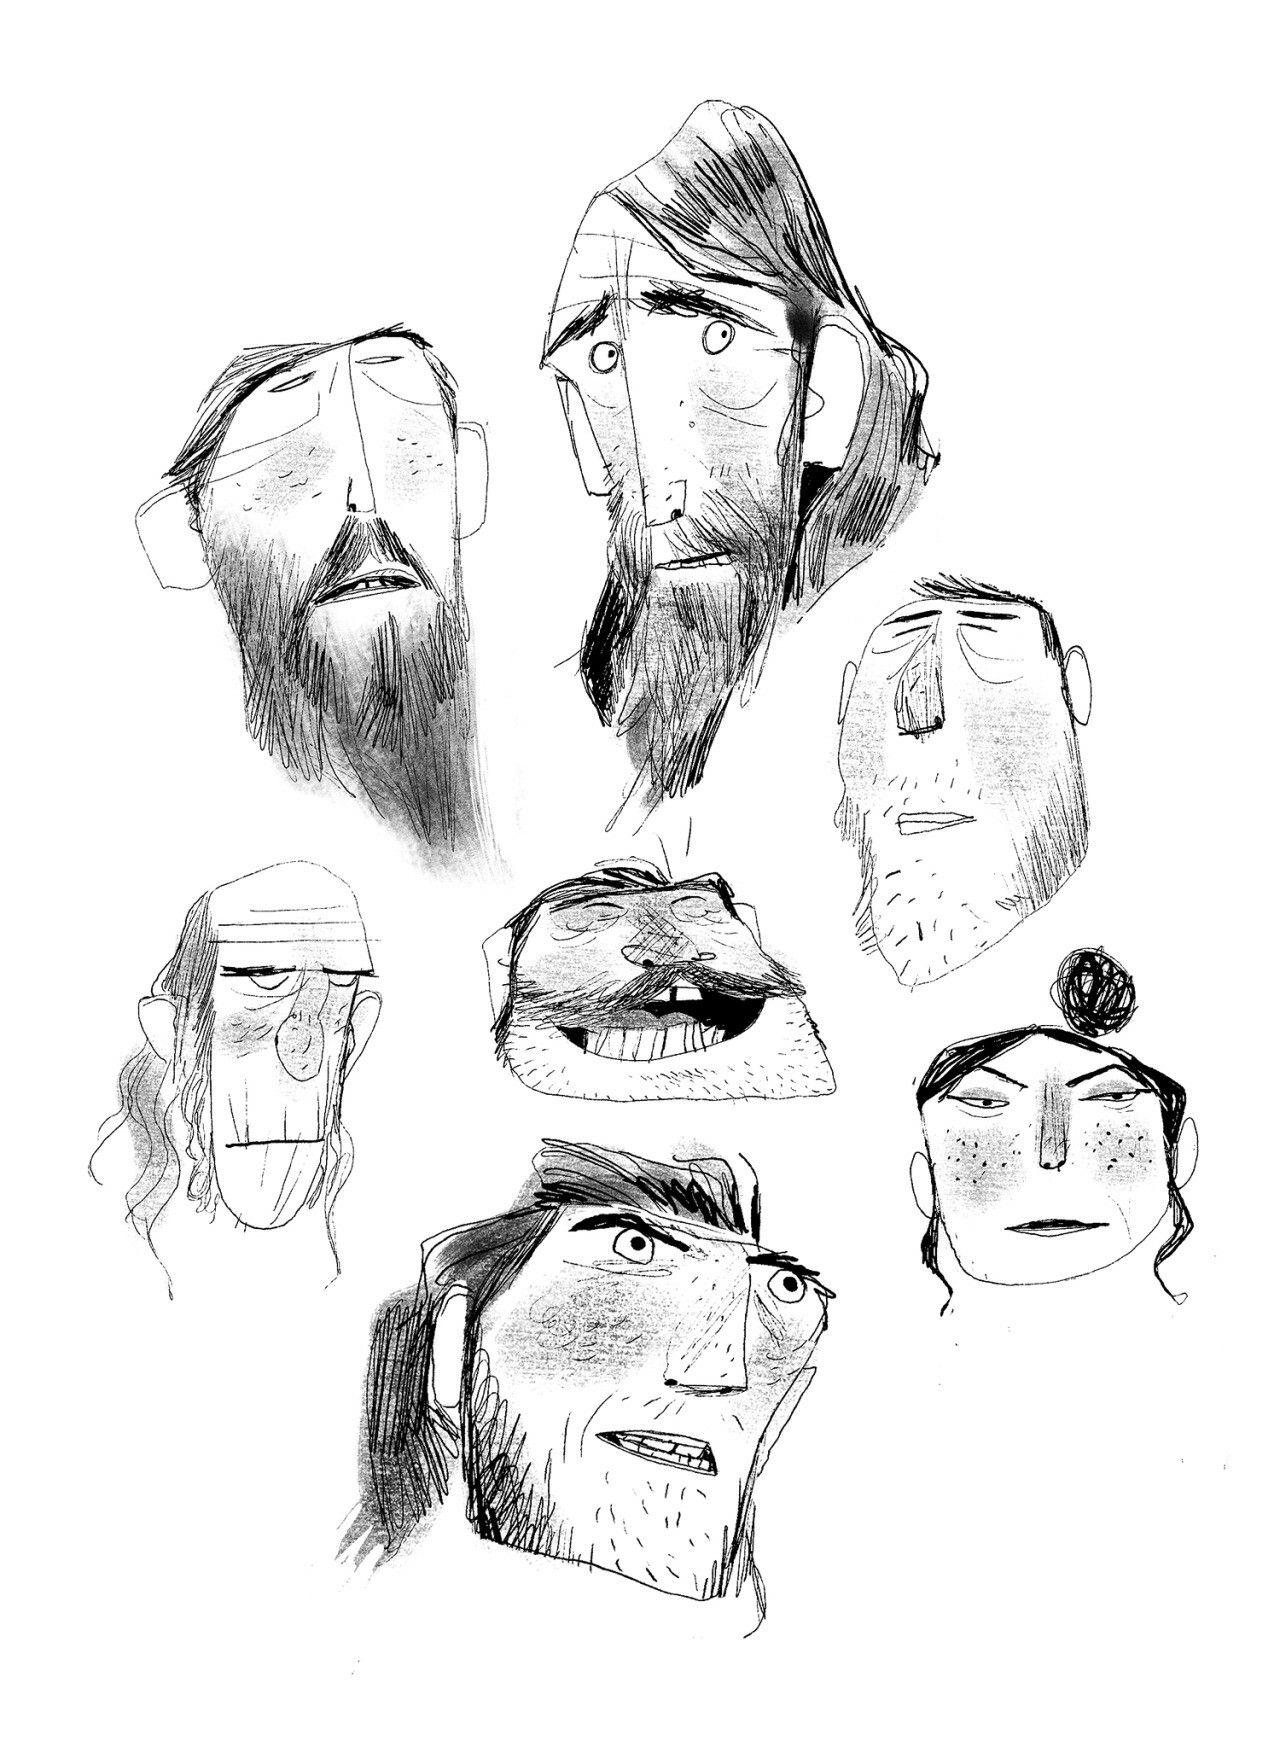 Pin de Santiago Ospina en Characters | Pinterest | Loko ...